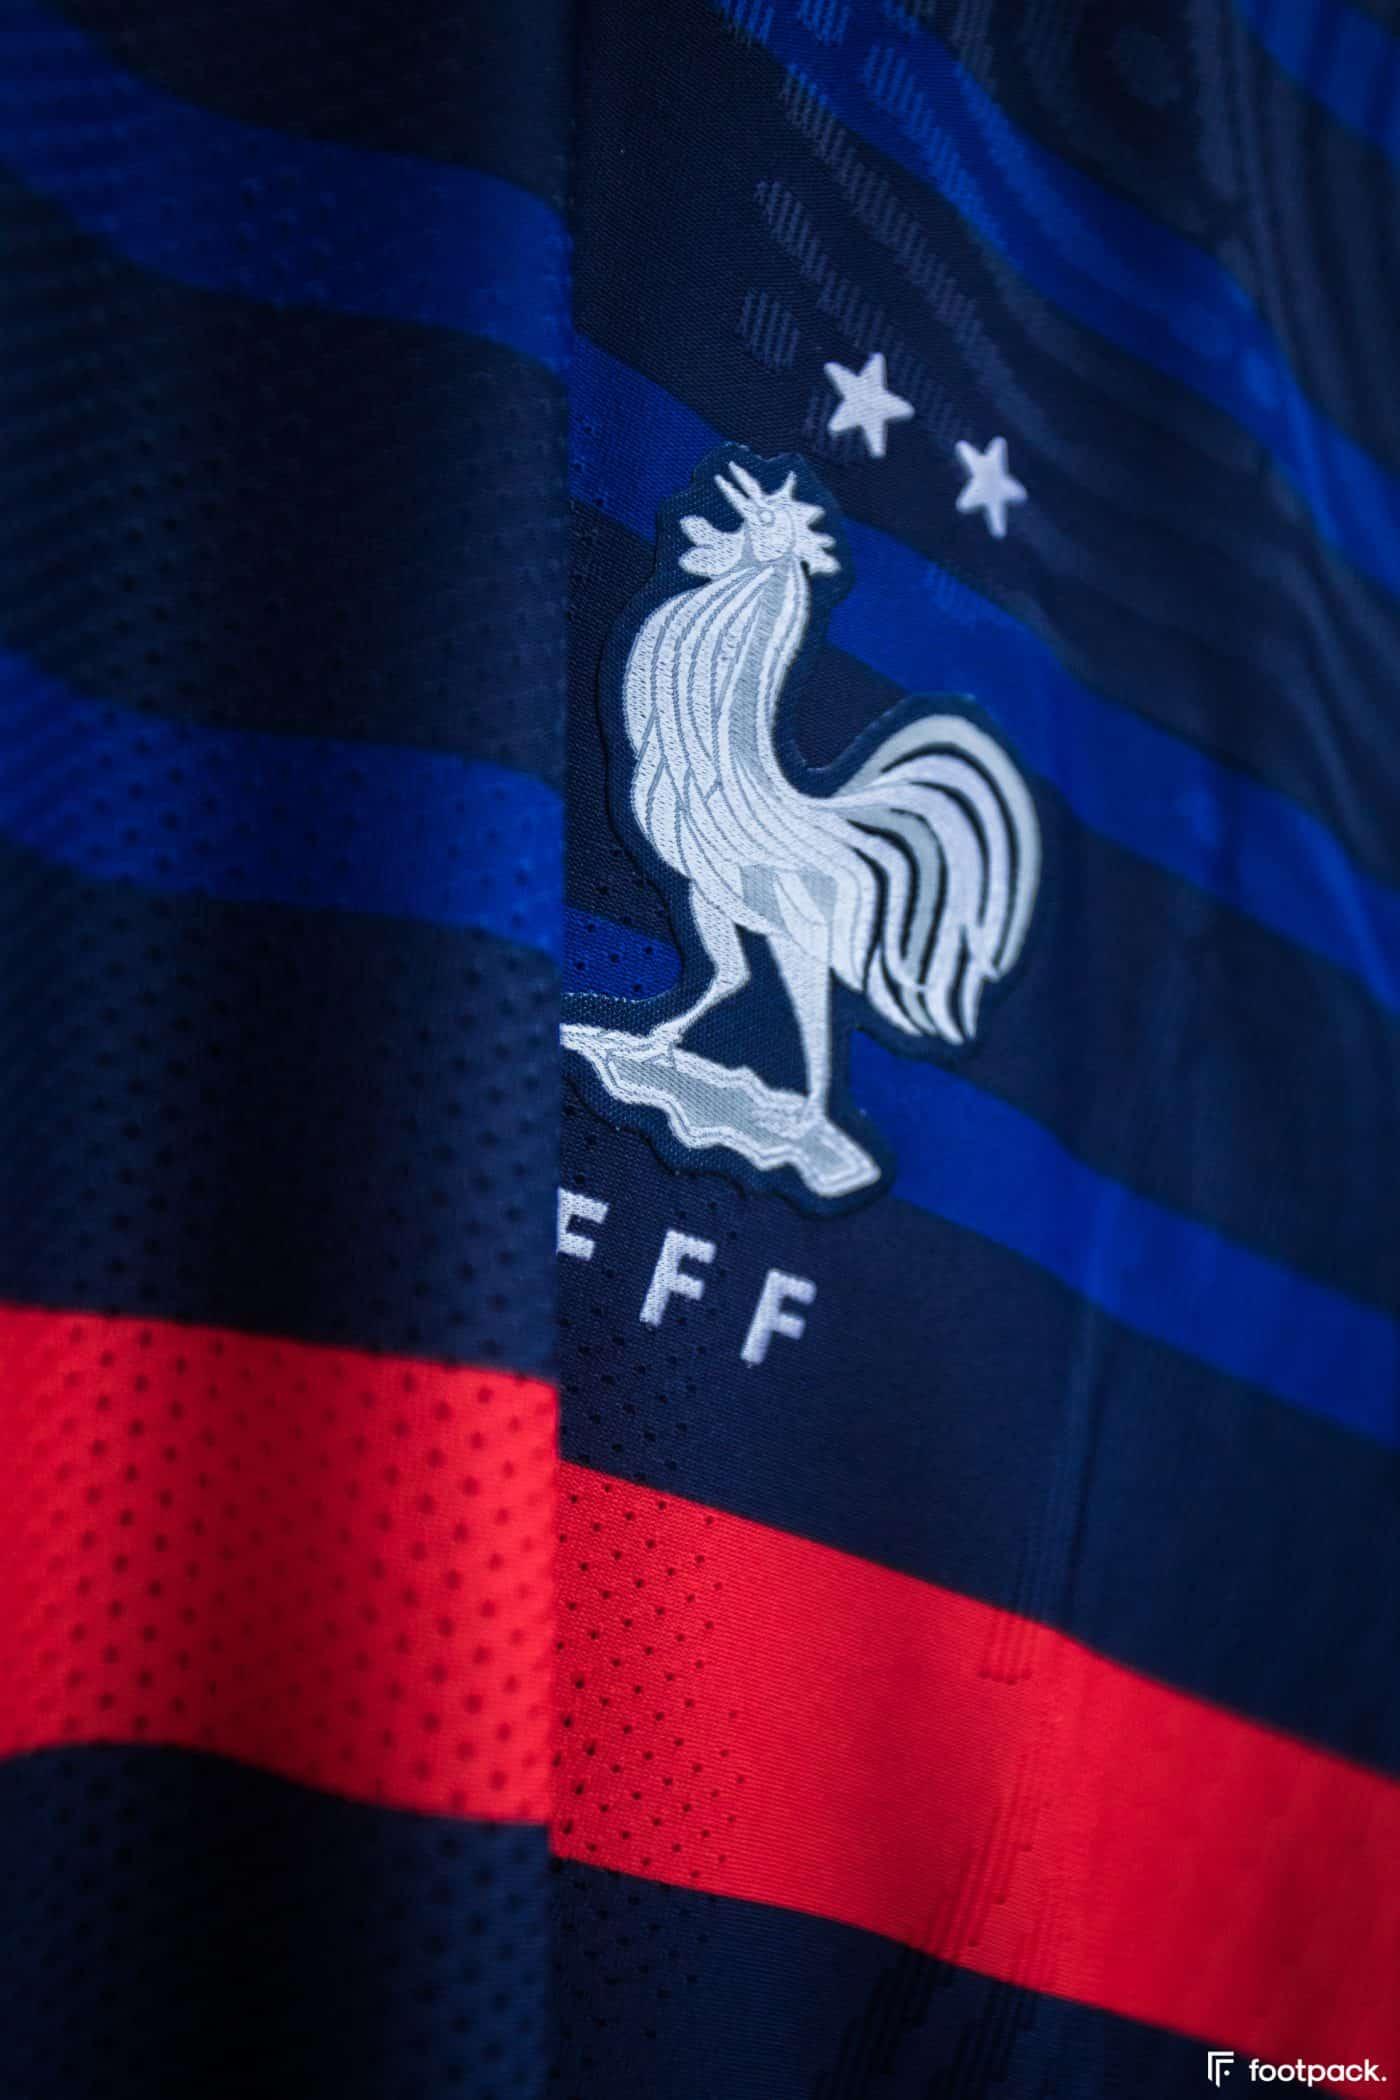 shooting-maillot-france-2020-nike-footapck-30